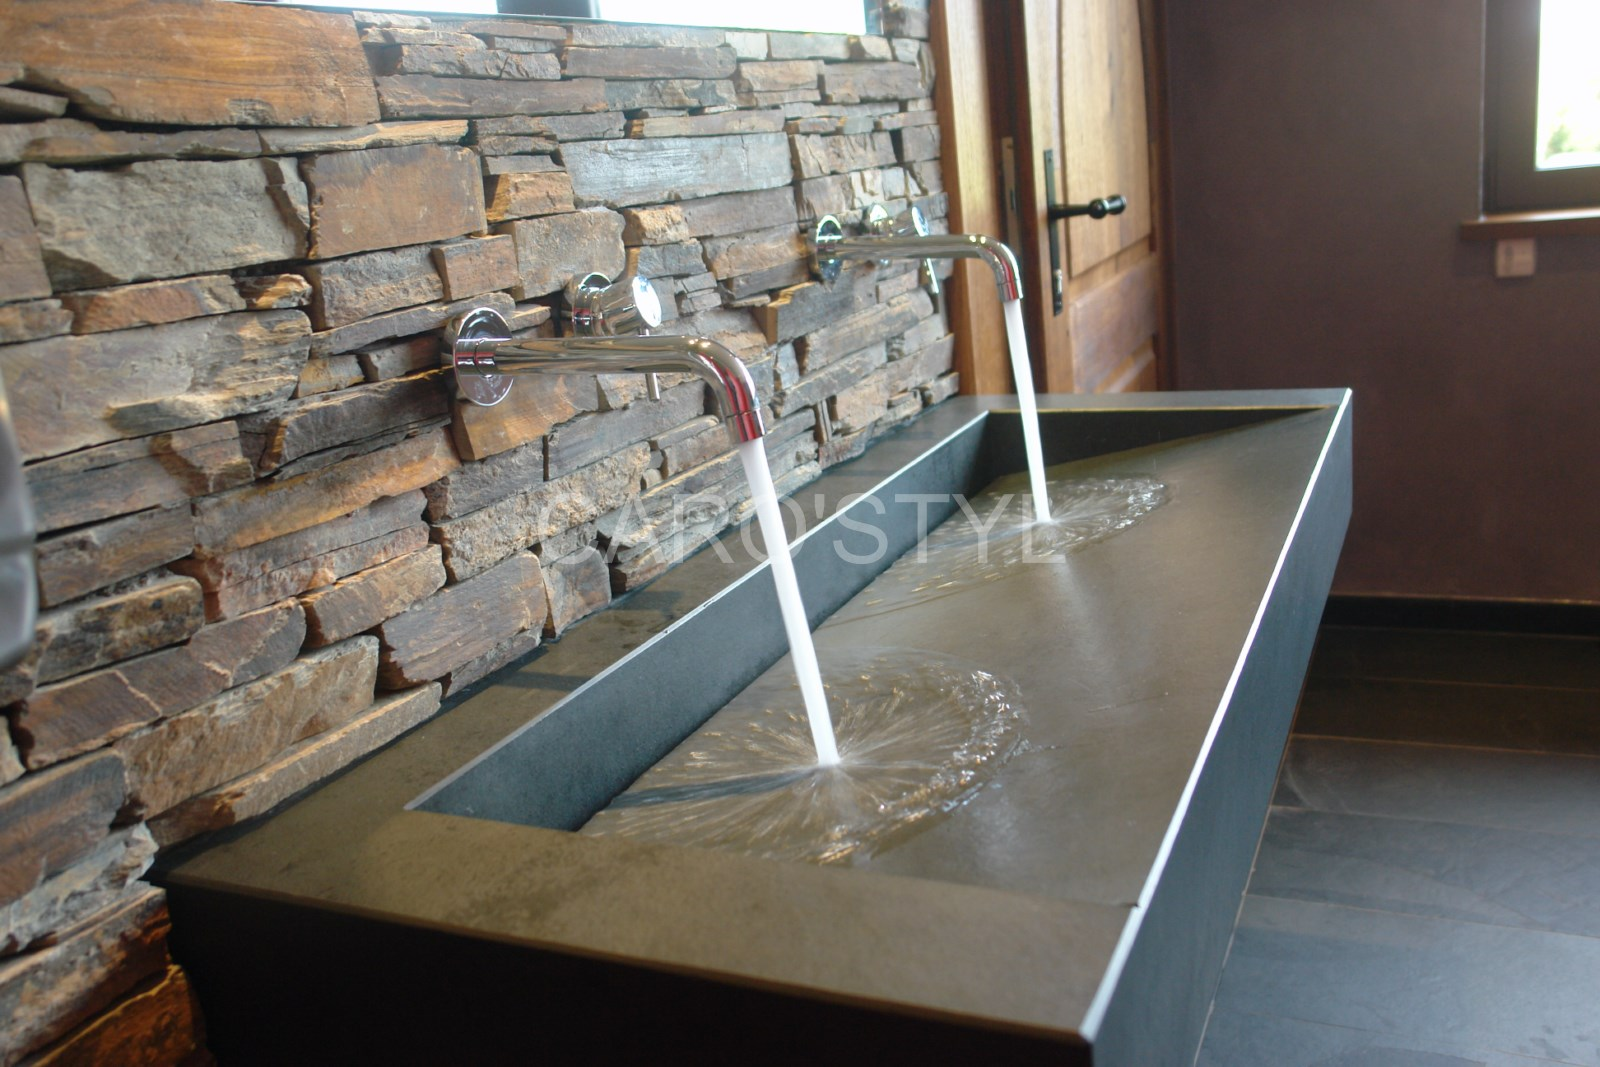 vasque en pierre noire vacuation par derri re magasin. Black Bedroom Furniture Sets. Home Design Ideas